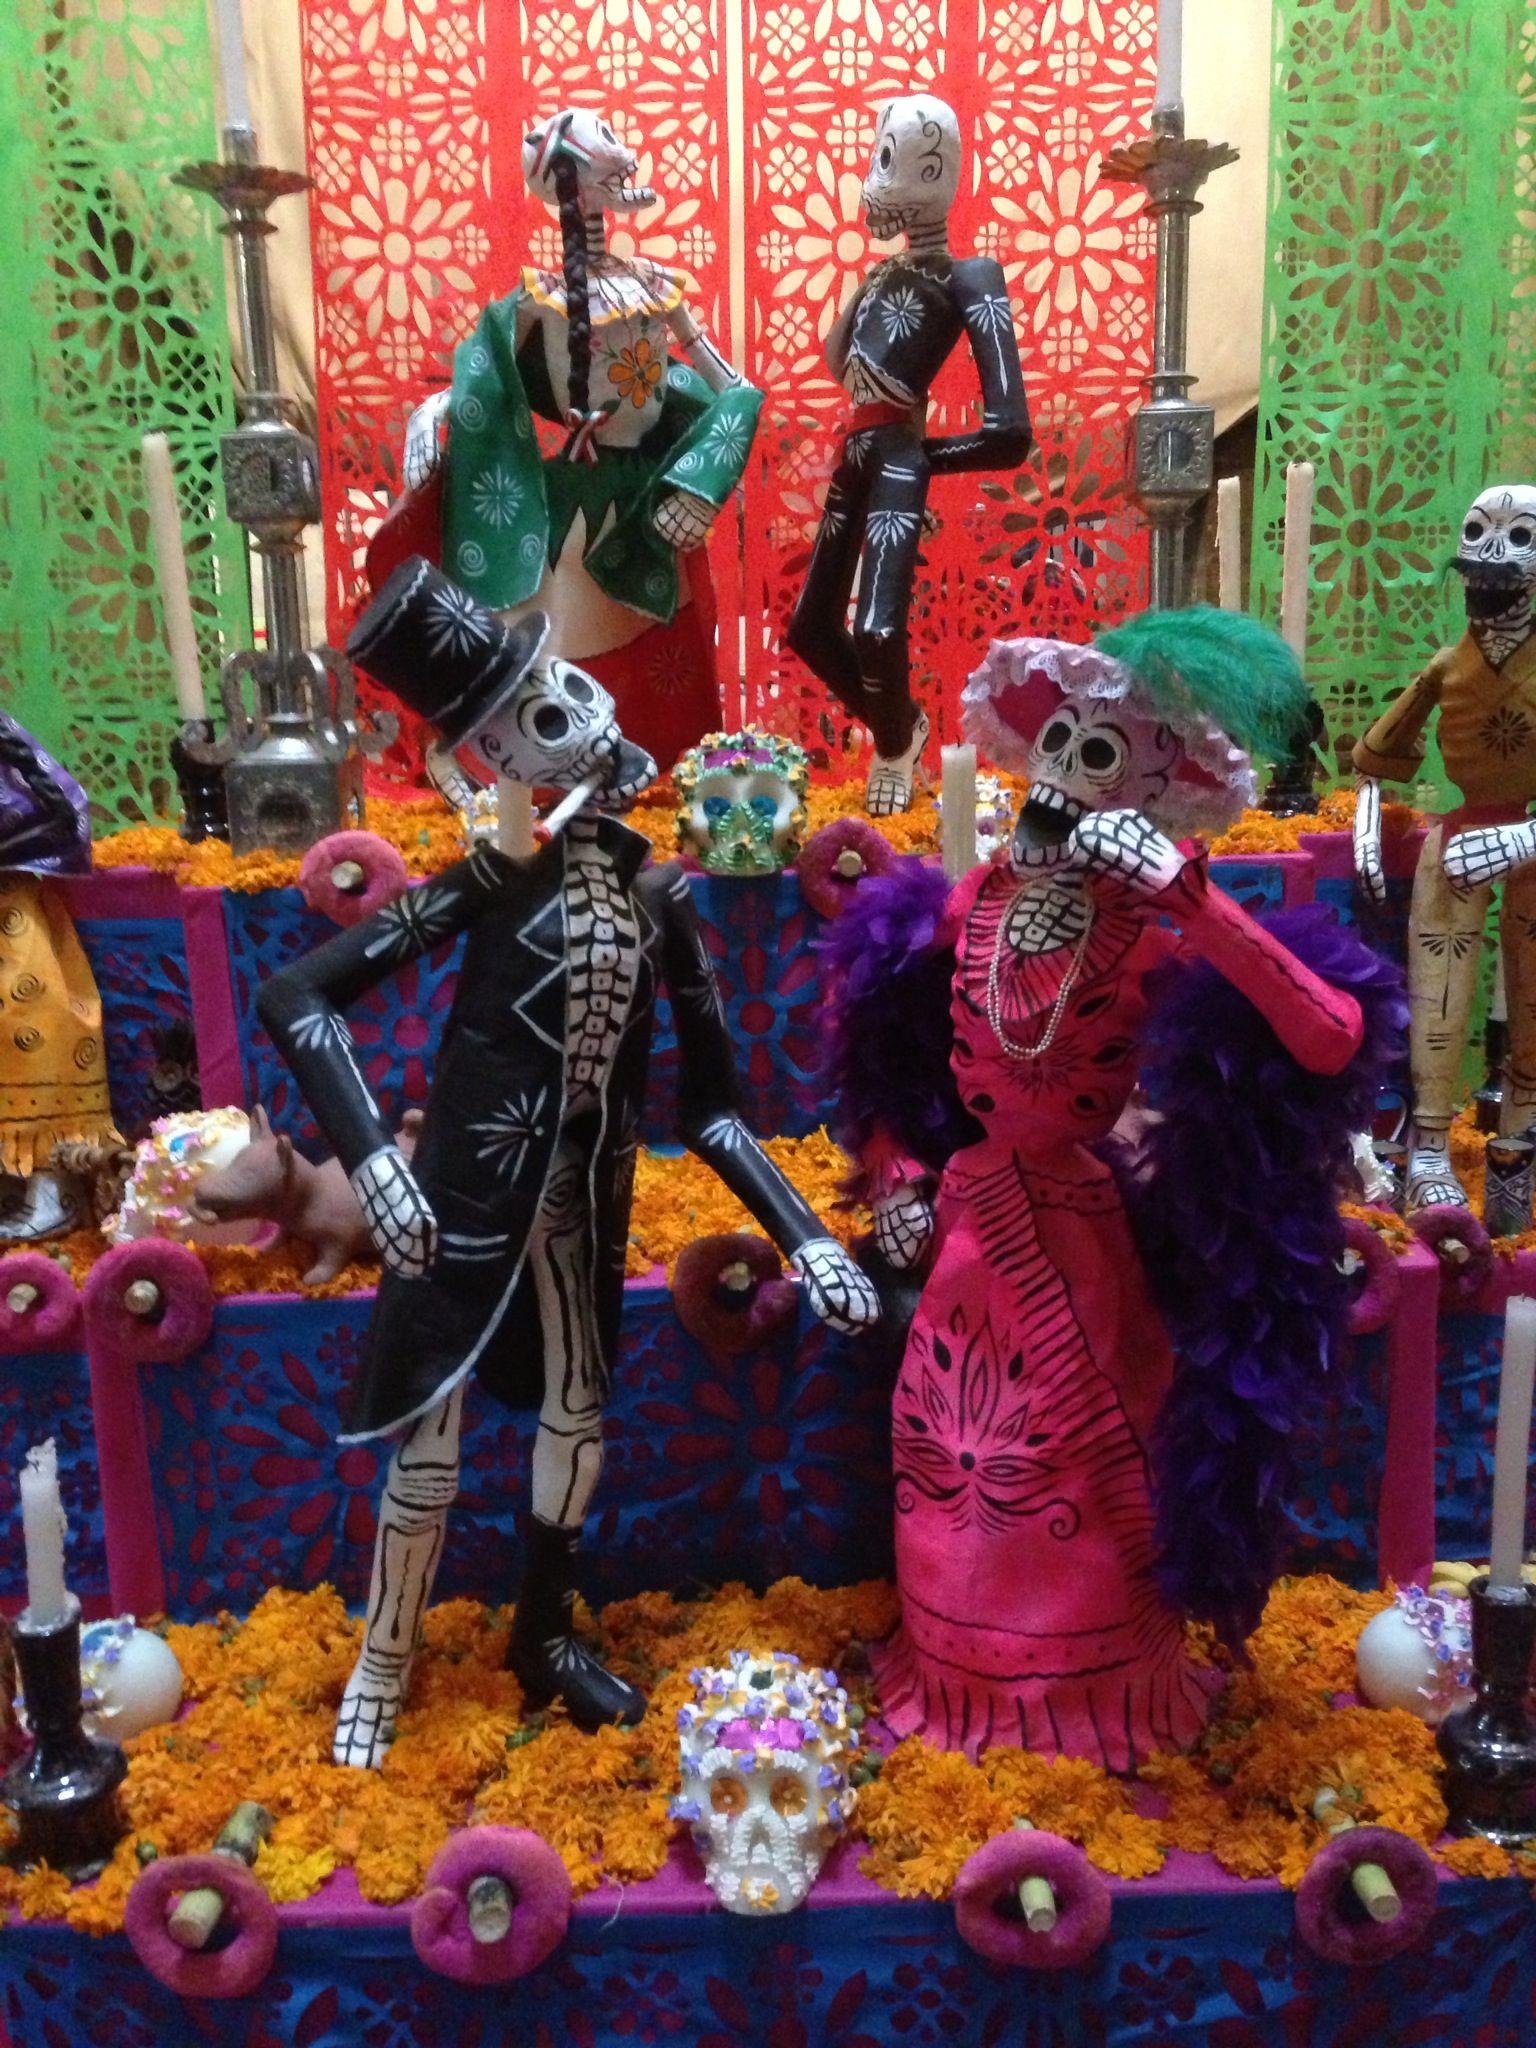 Mexico Dia del Muerte Halloween wreath, Decor, Day of